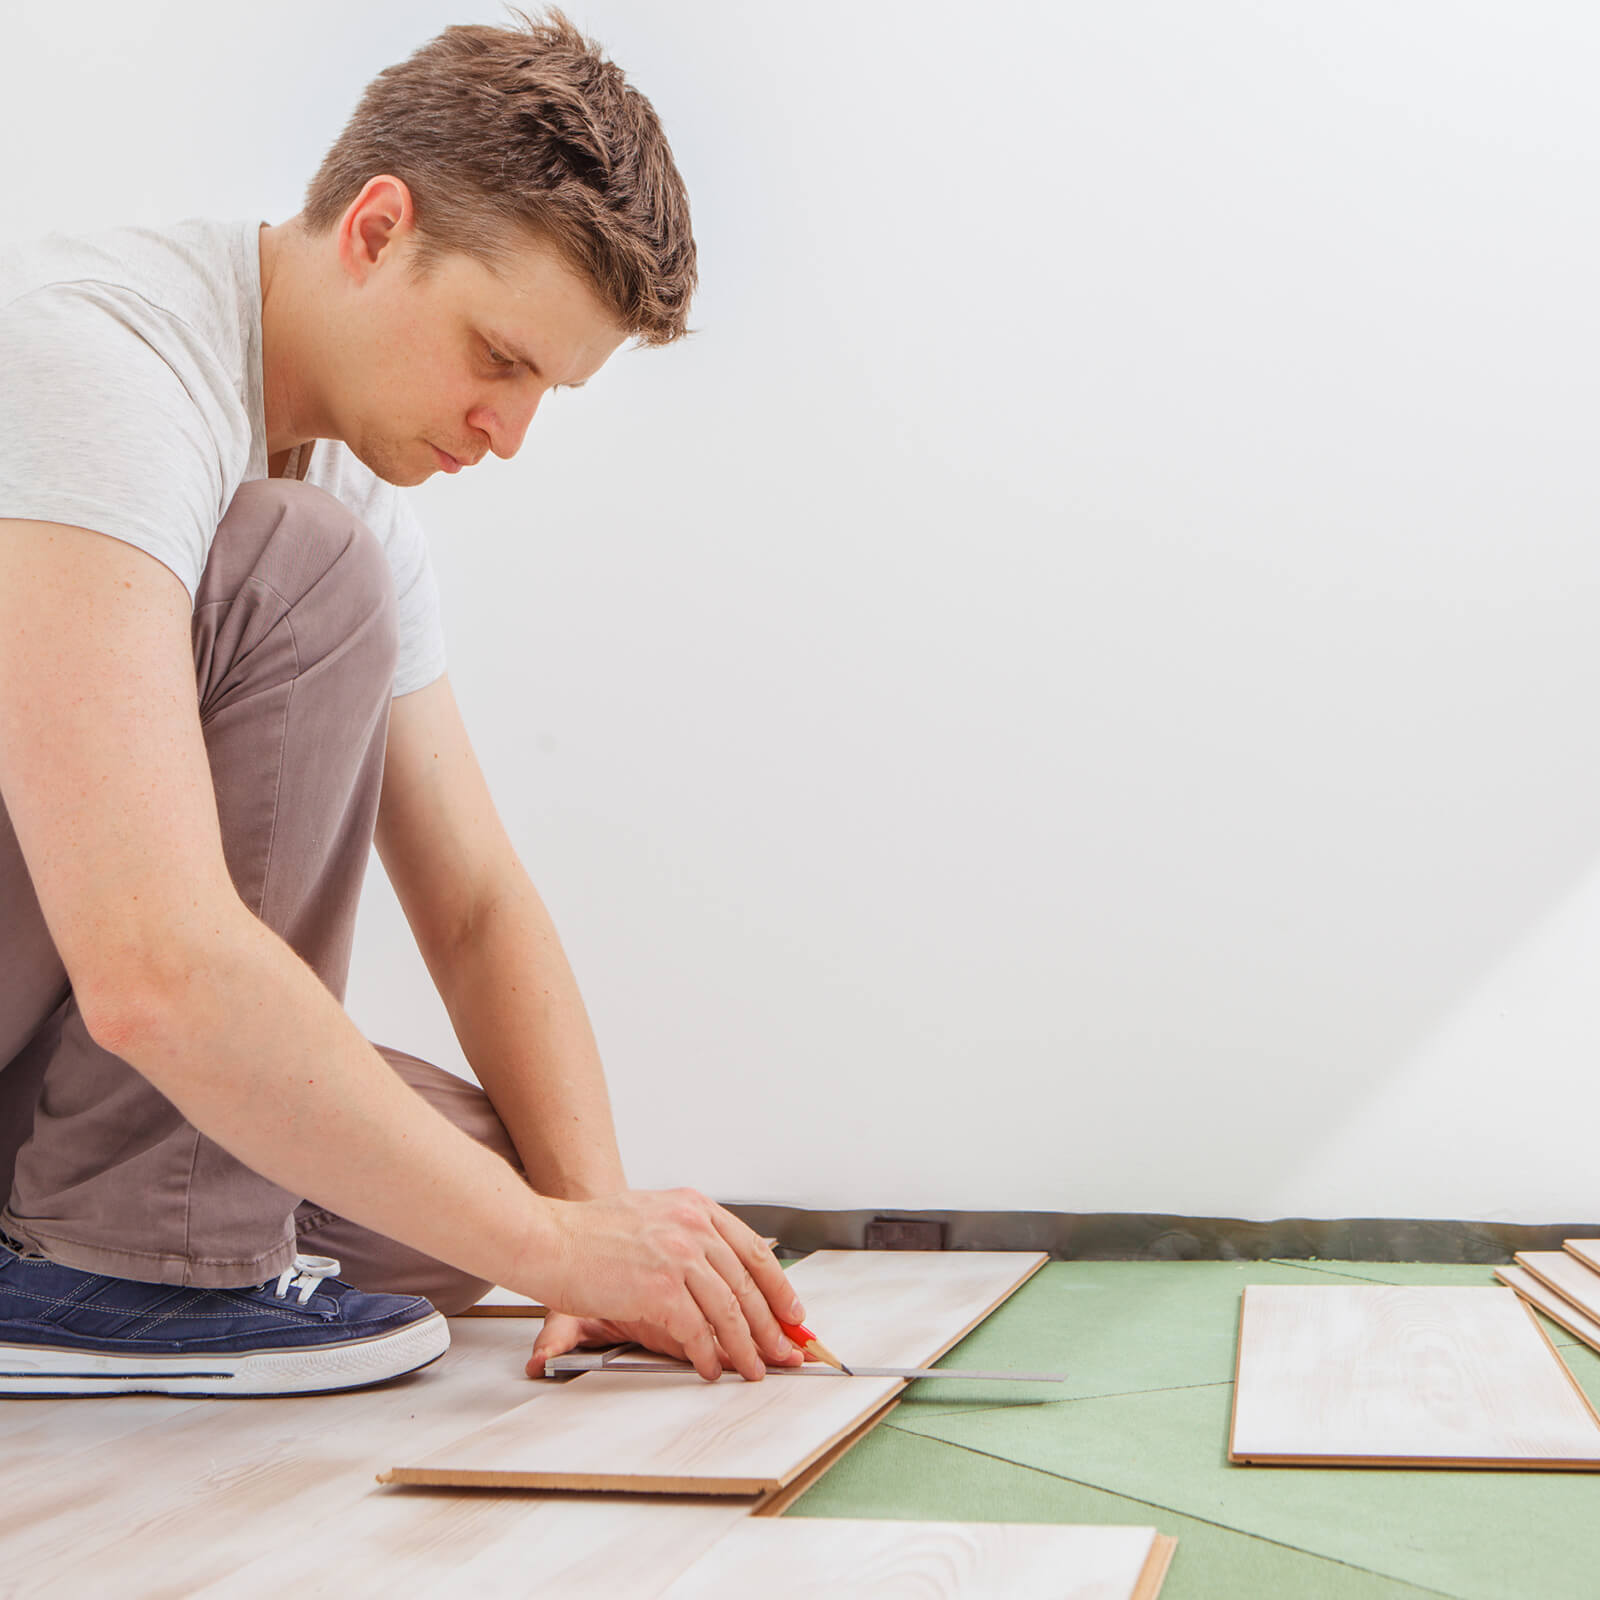 Installing luxury vinyl plank flooring in Evans, GA | Kirkland's Flooring